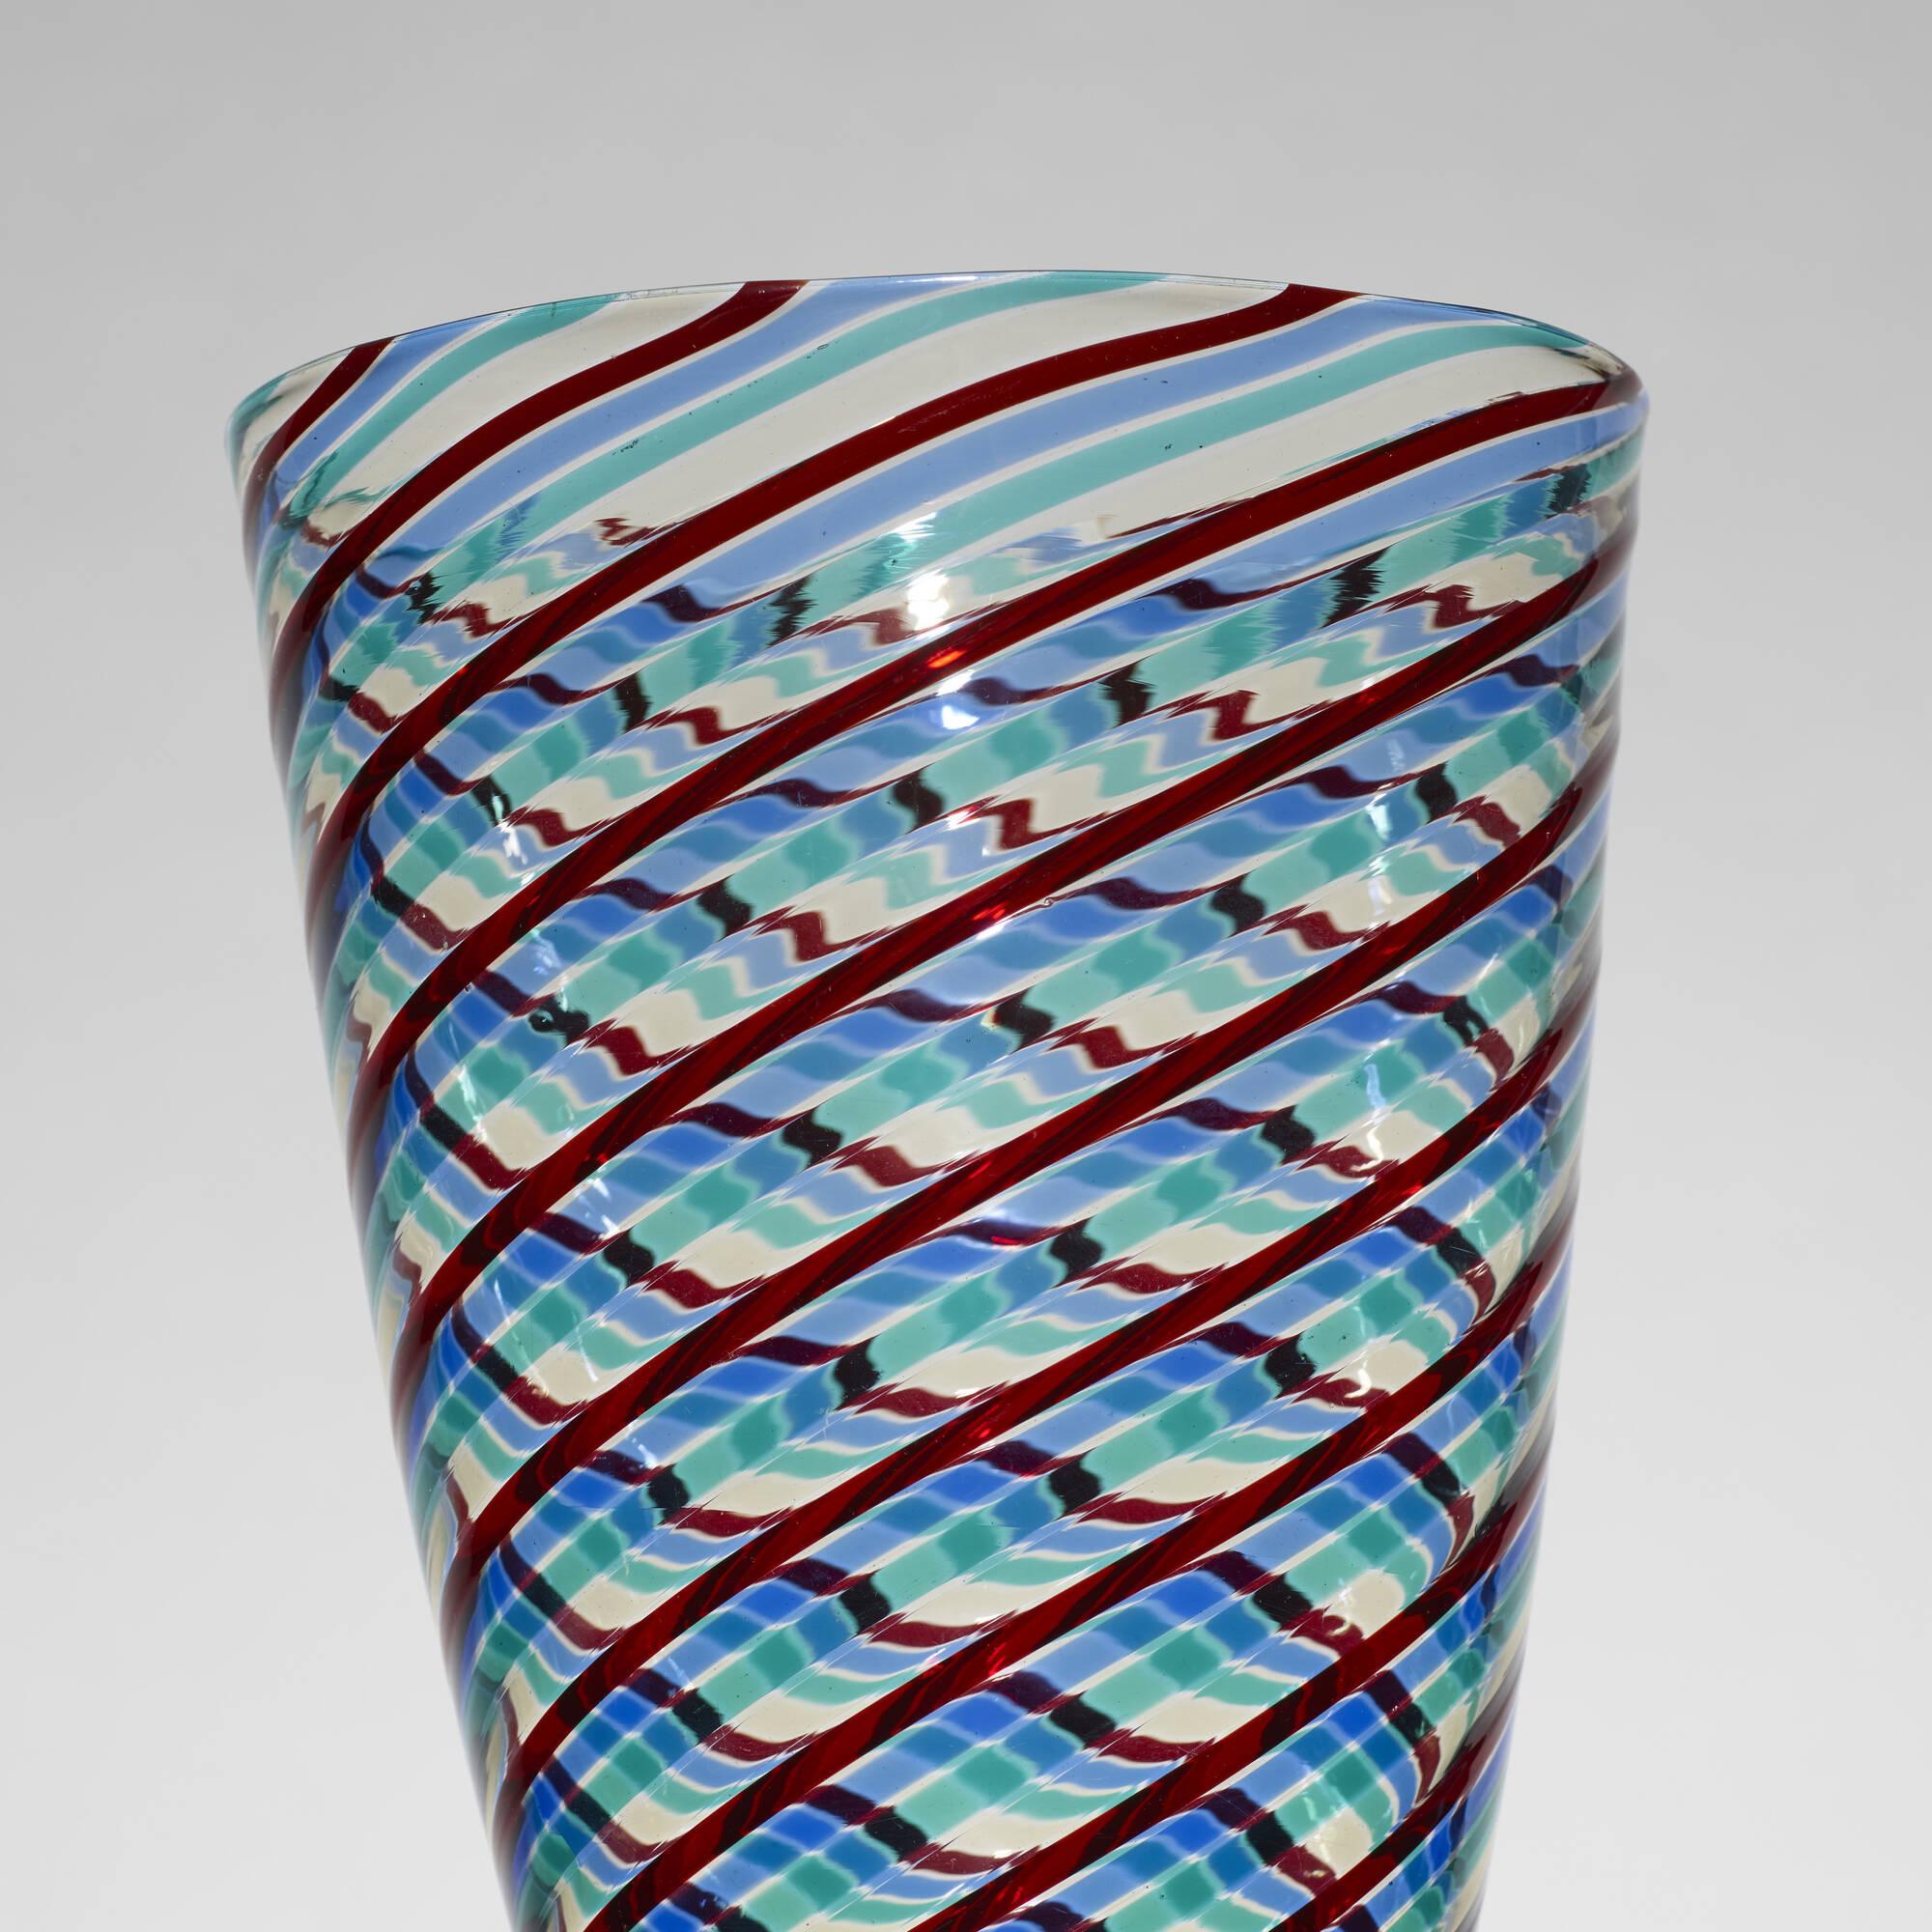 145: Fulvio Bianconi / a Fasce Ritorte vase (2 of 2)